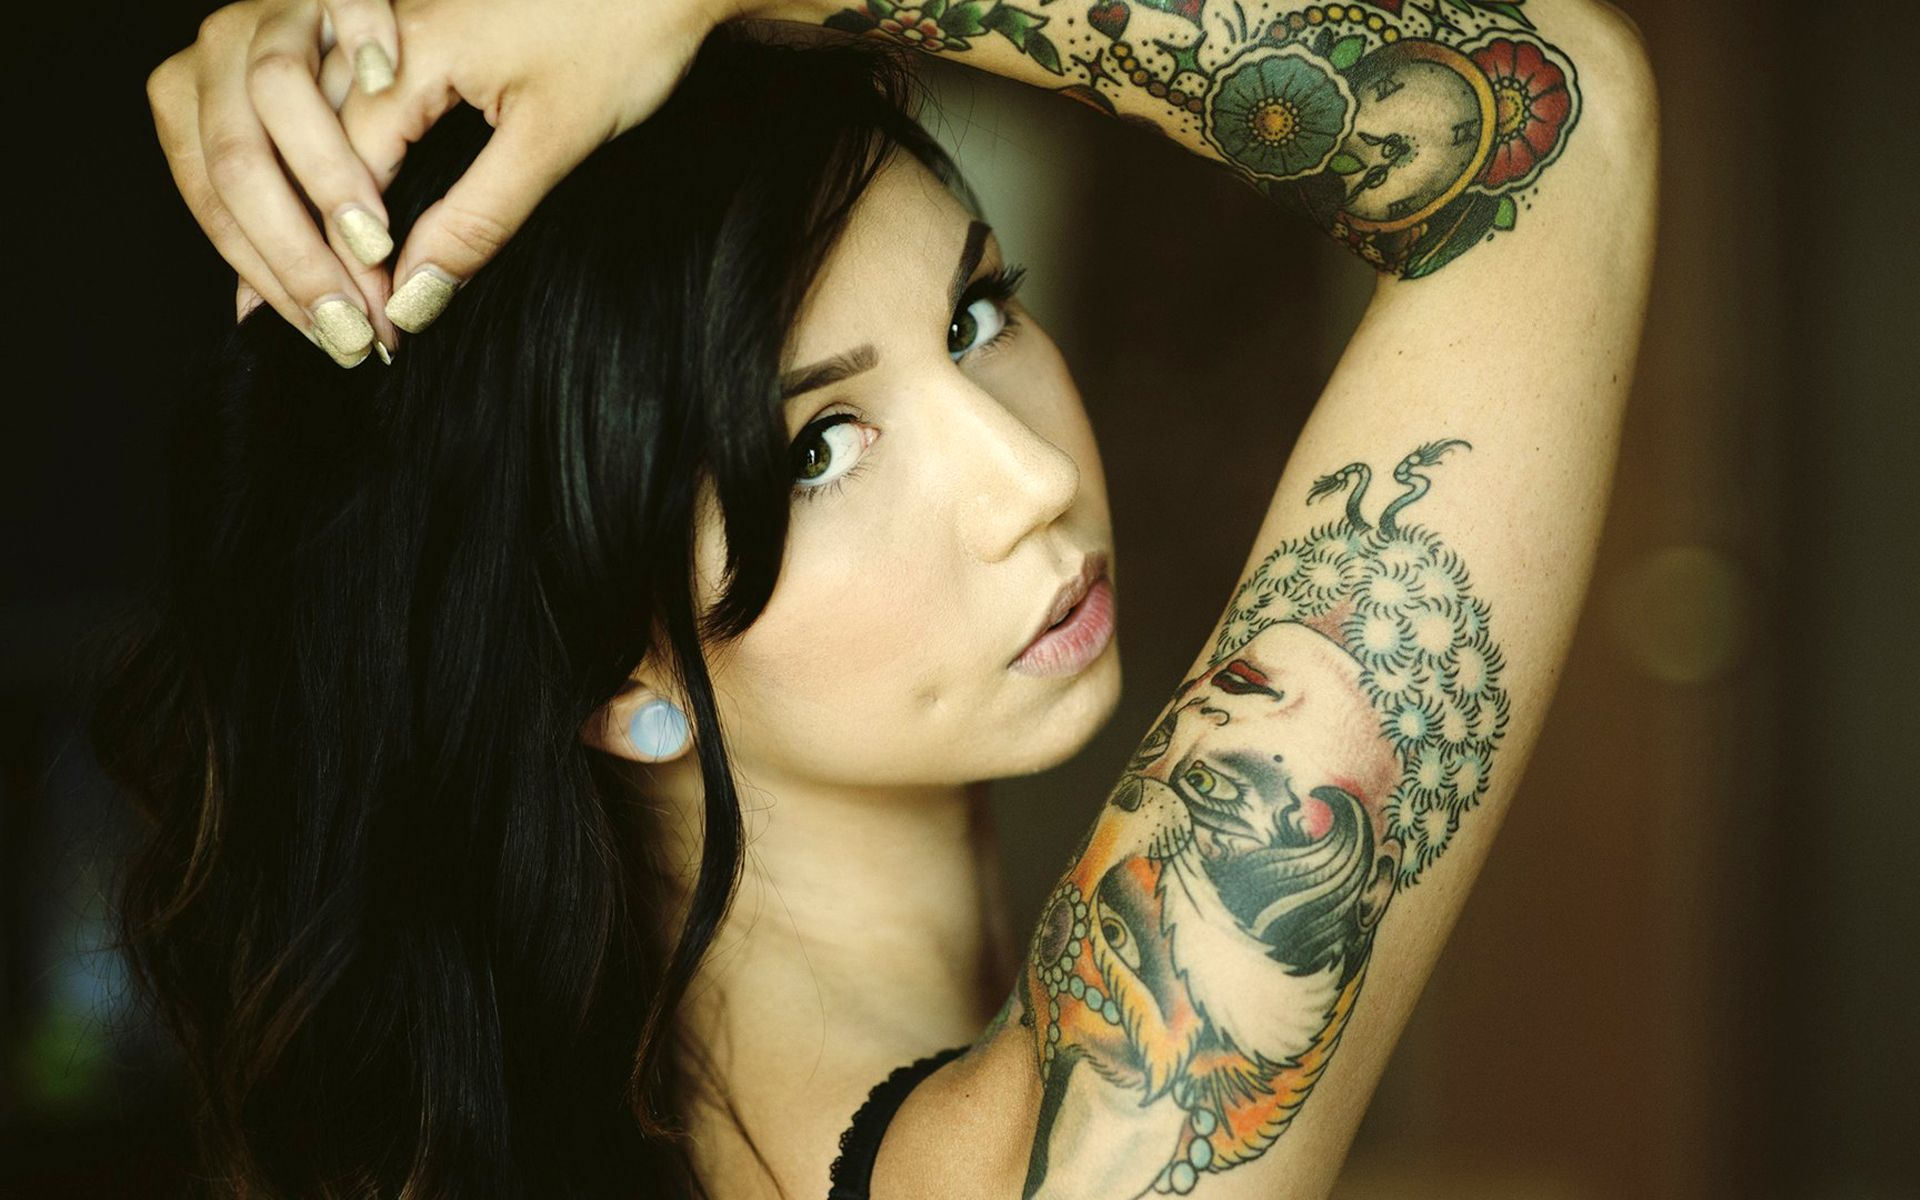 Hd wallpaper, Tattooed girls and Girl tattoos